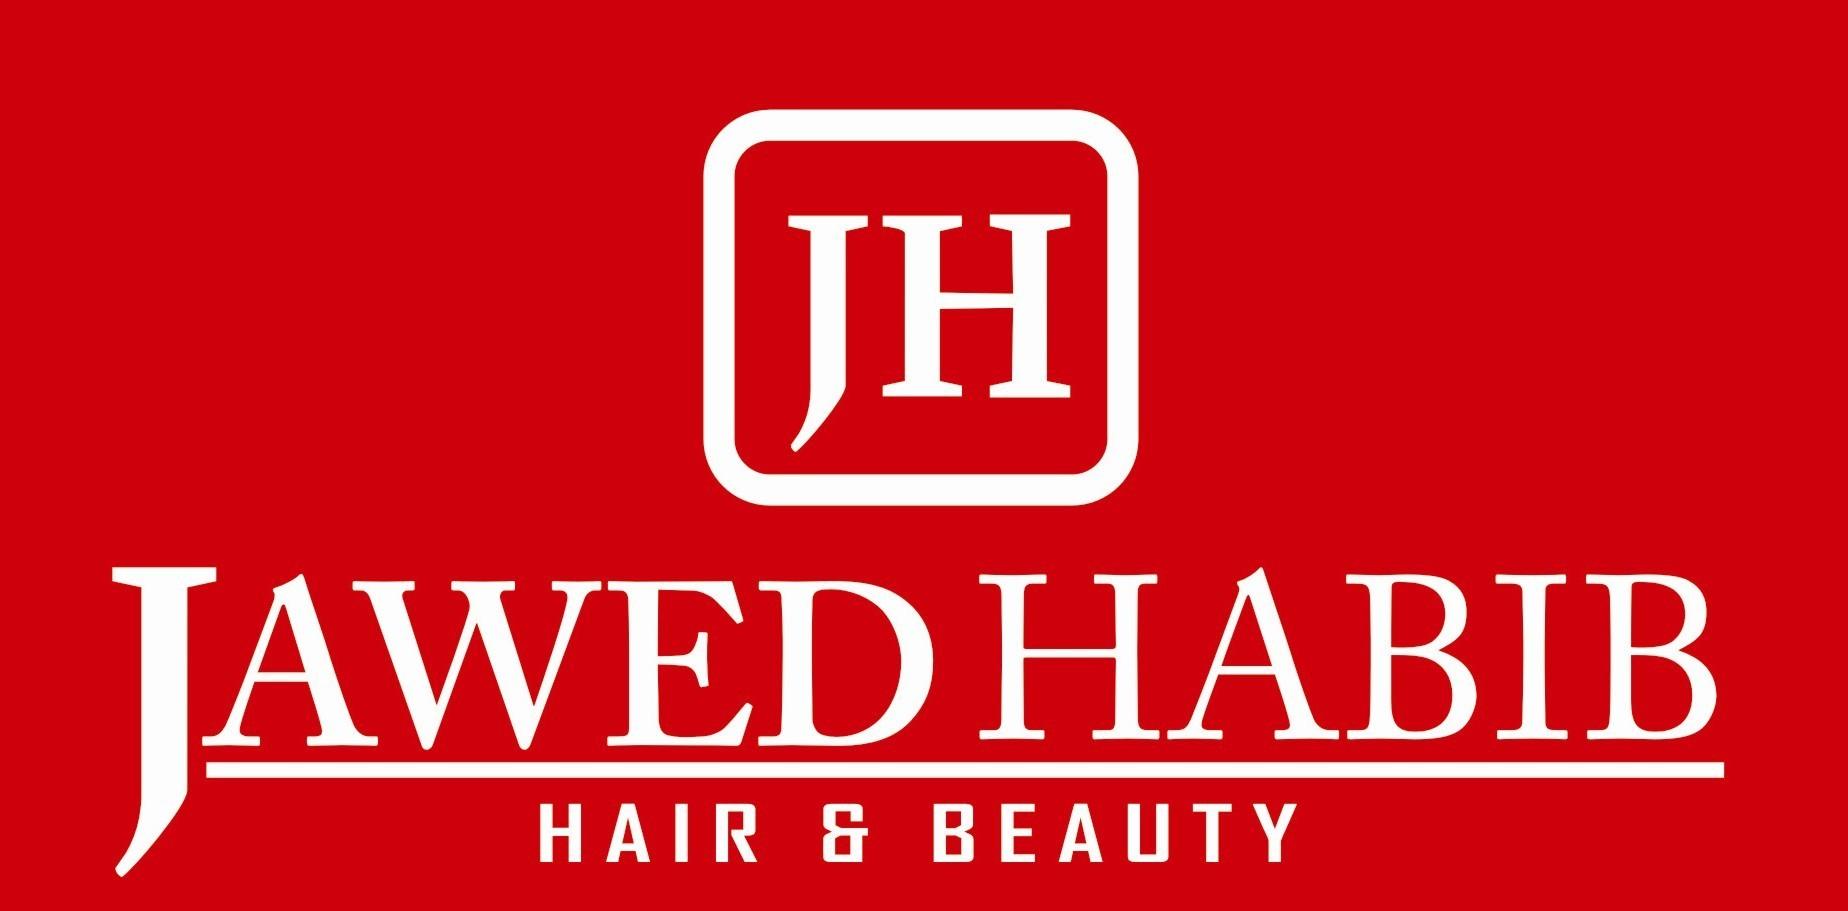 Jawed Habib Hair & Beauty Salons - Vigyan Nagar Main Road - Kota Image